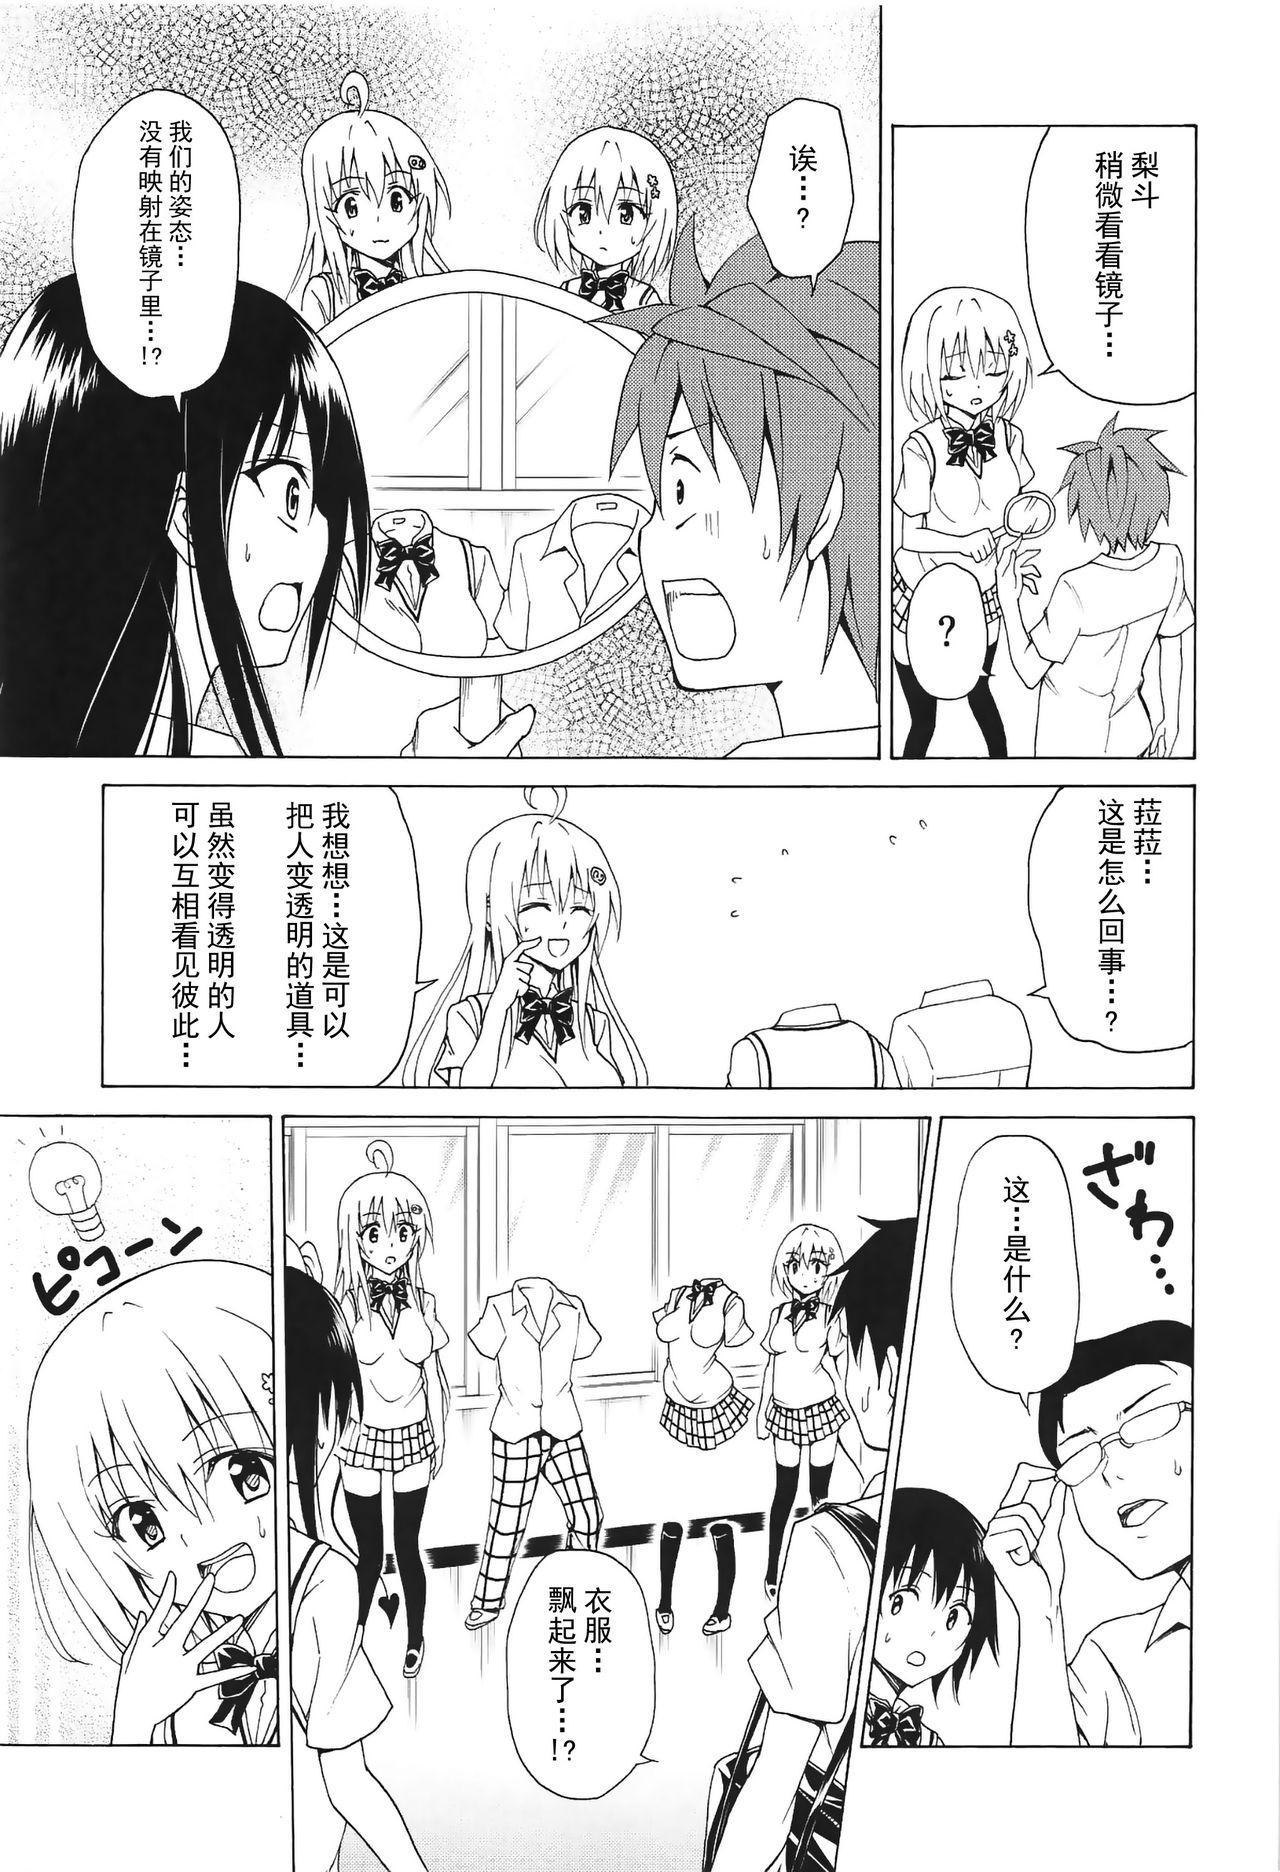 Mezase! Rakuen Keikaku Vol. 5 6